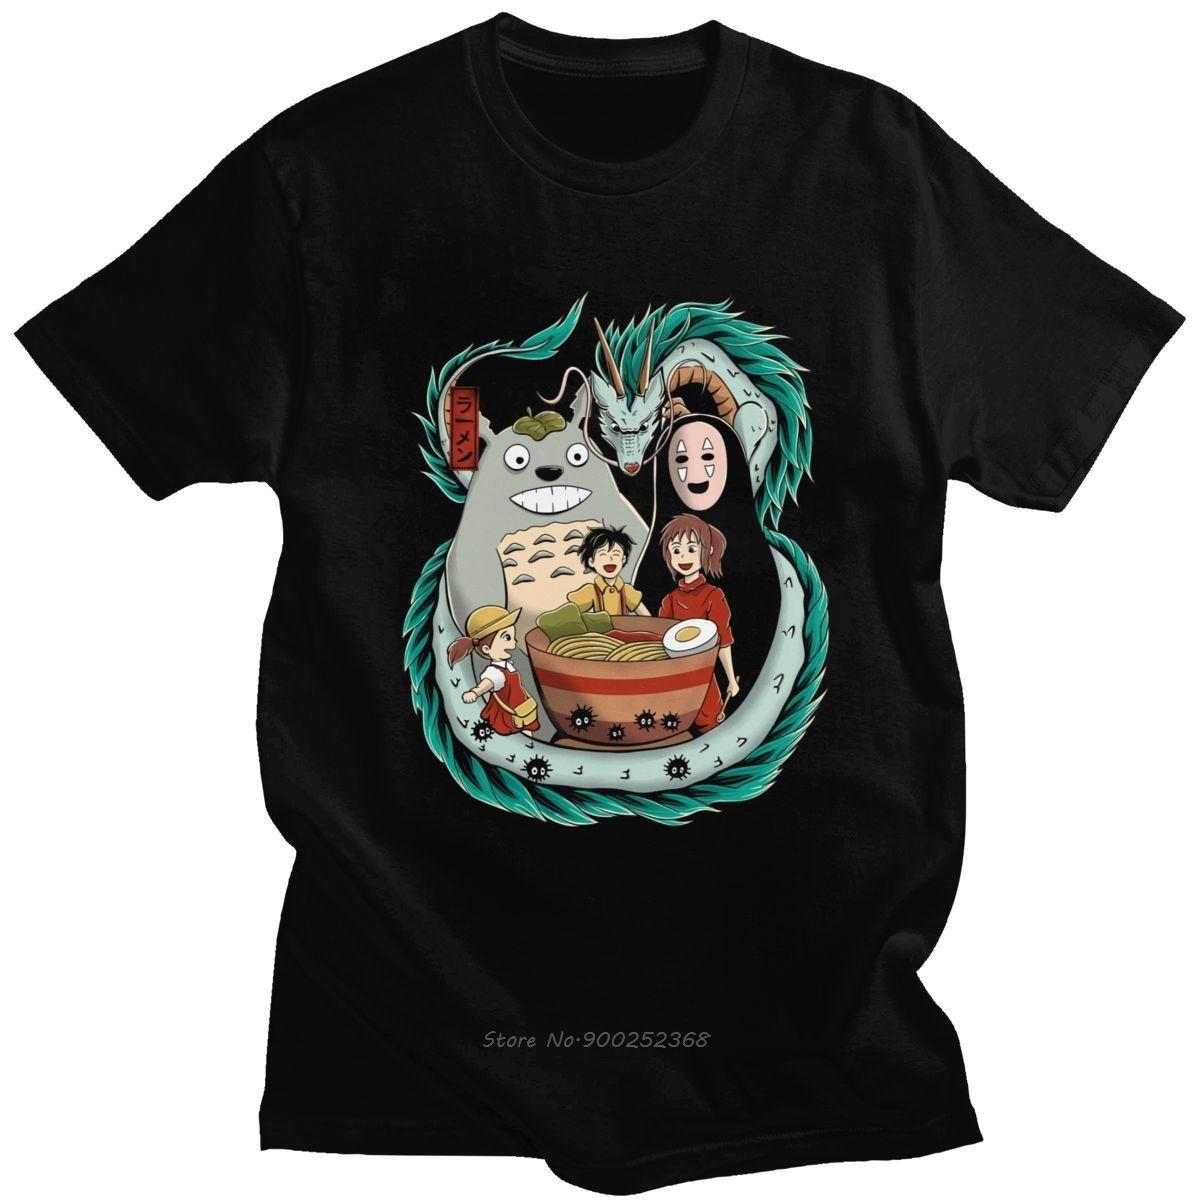 Meu Vizinho Totoro T Shirt Men Cotton T-shirt gráfico de manga curta Studio Ghibli A Viagem de Chihiro Hayao Miyazaki Anime T Top presente